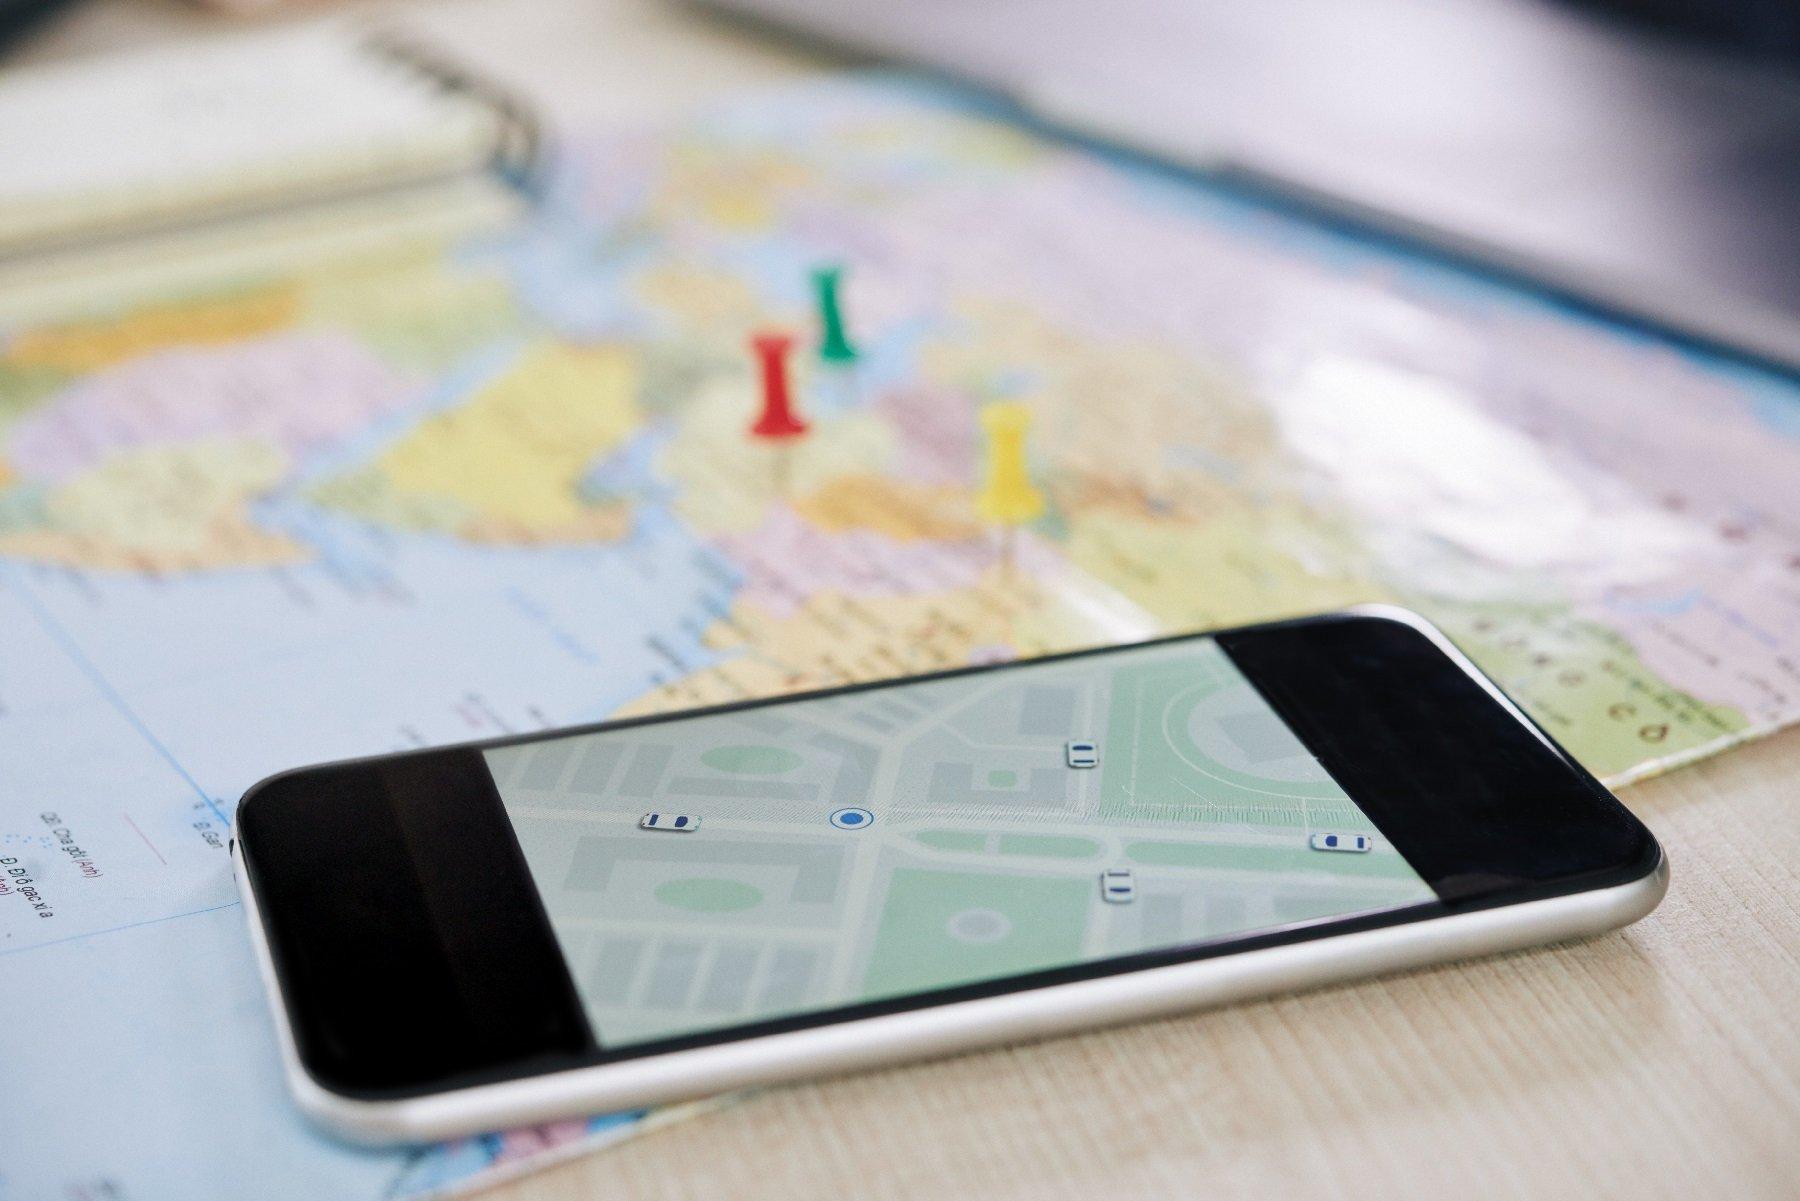 closeup-of-smartphone-with-gps-application-LLHJBM9